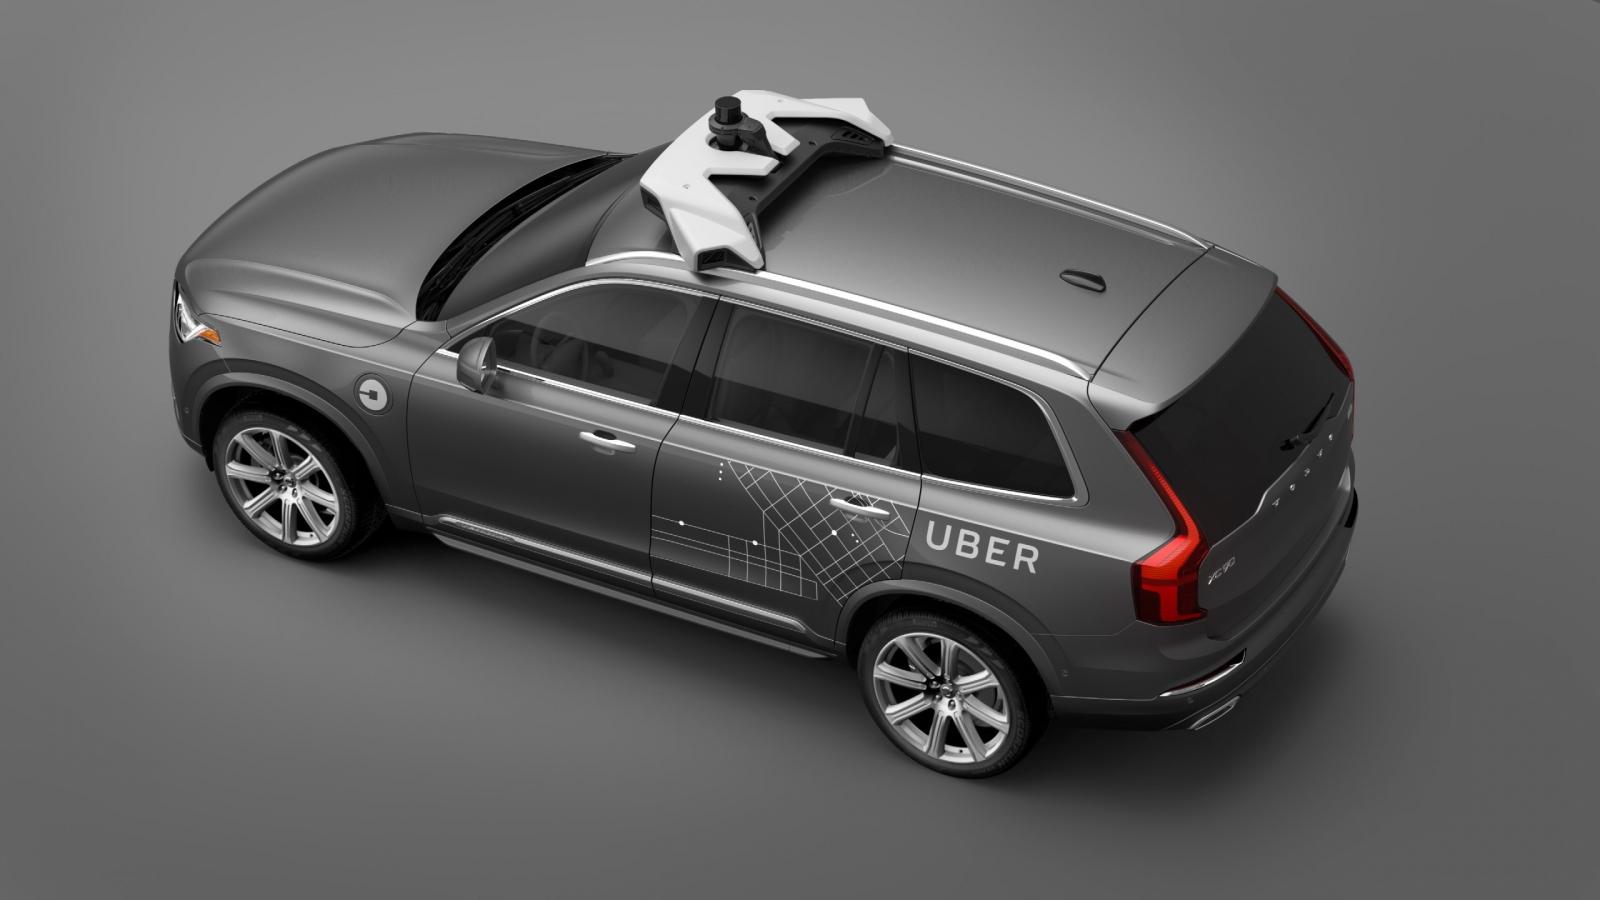 Uber, sospesi i test dei veicoli autonomi a San Francisco